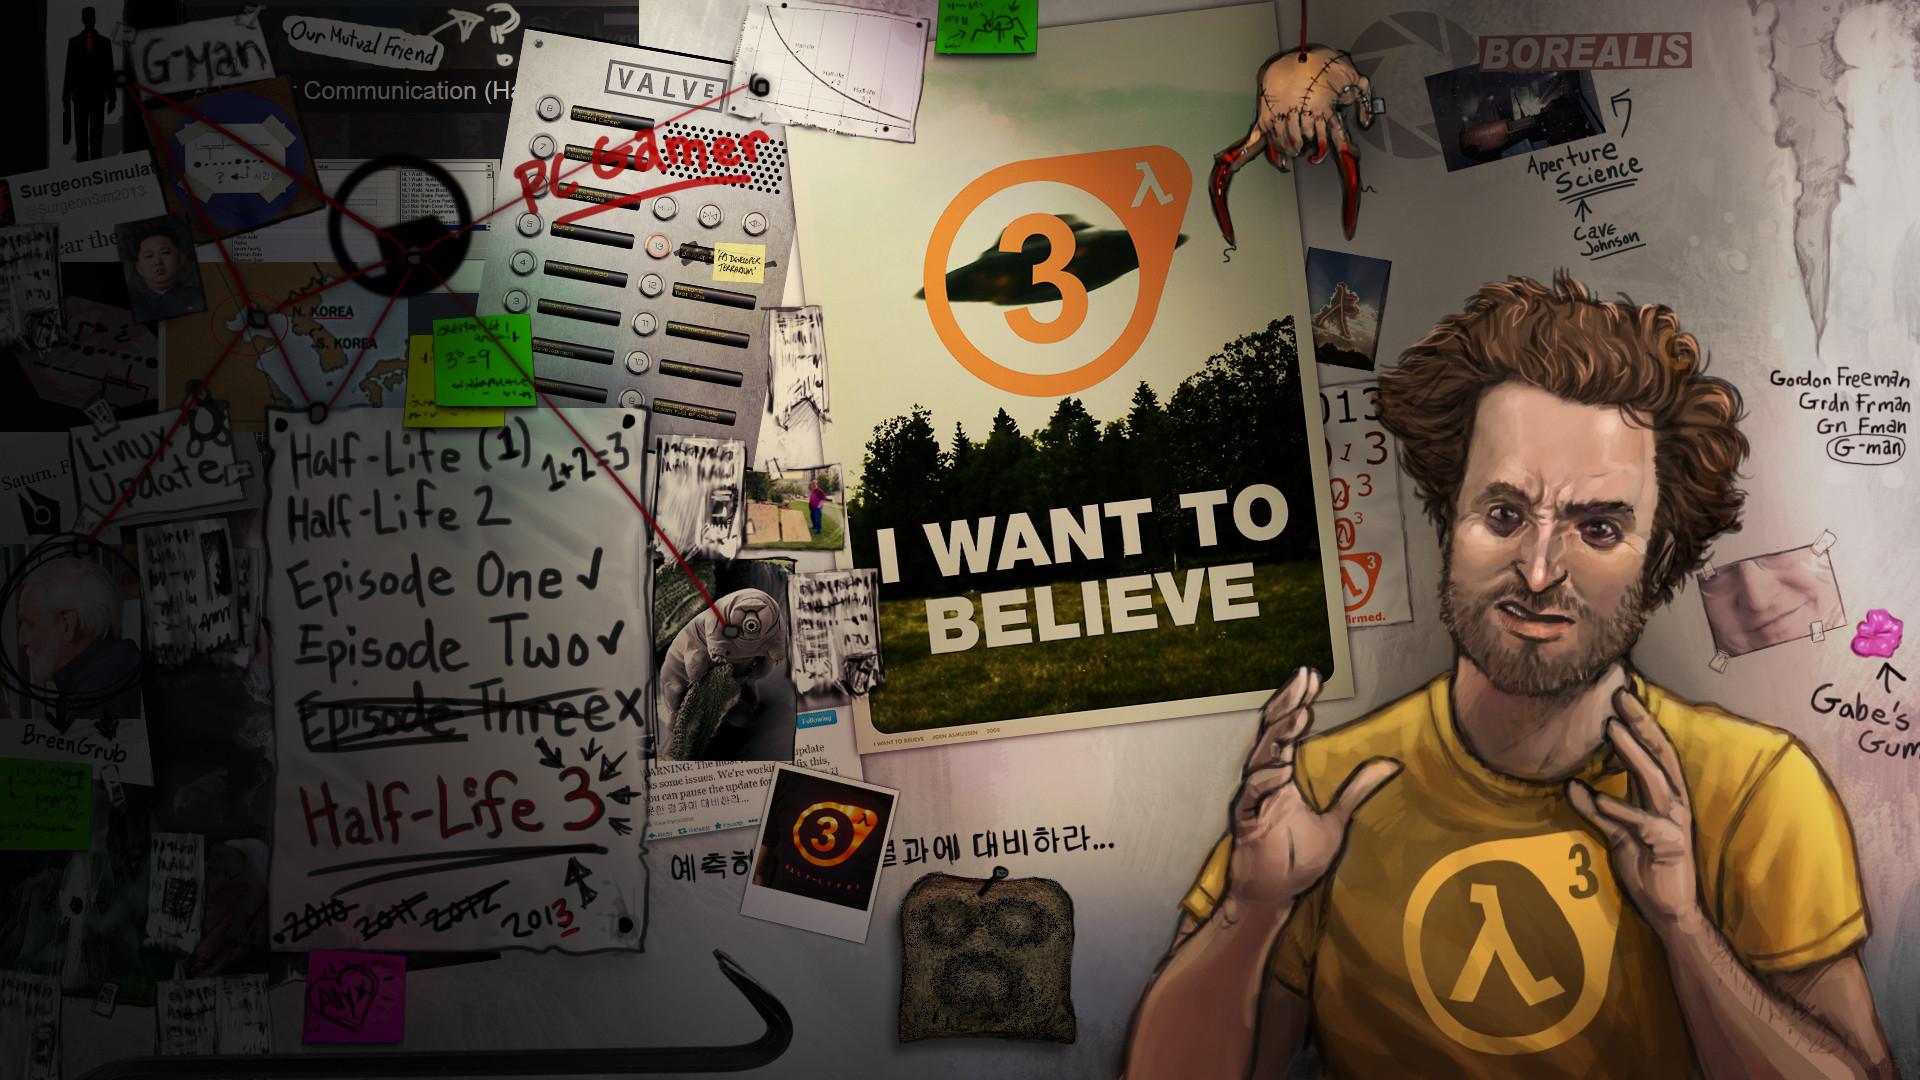 half-life-3-i-want-to-believe.jpg